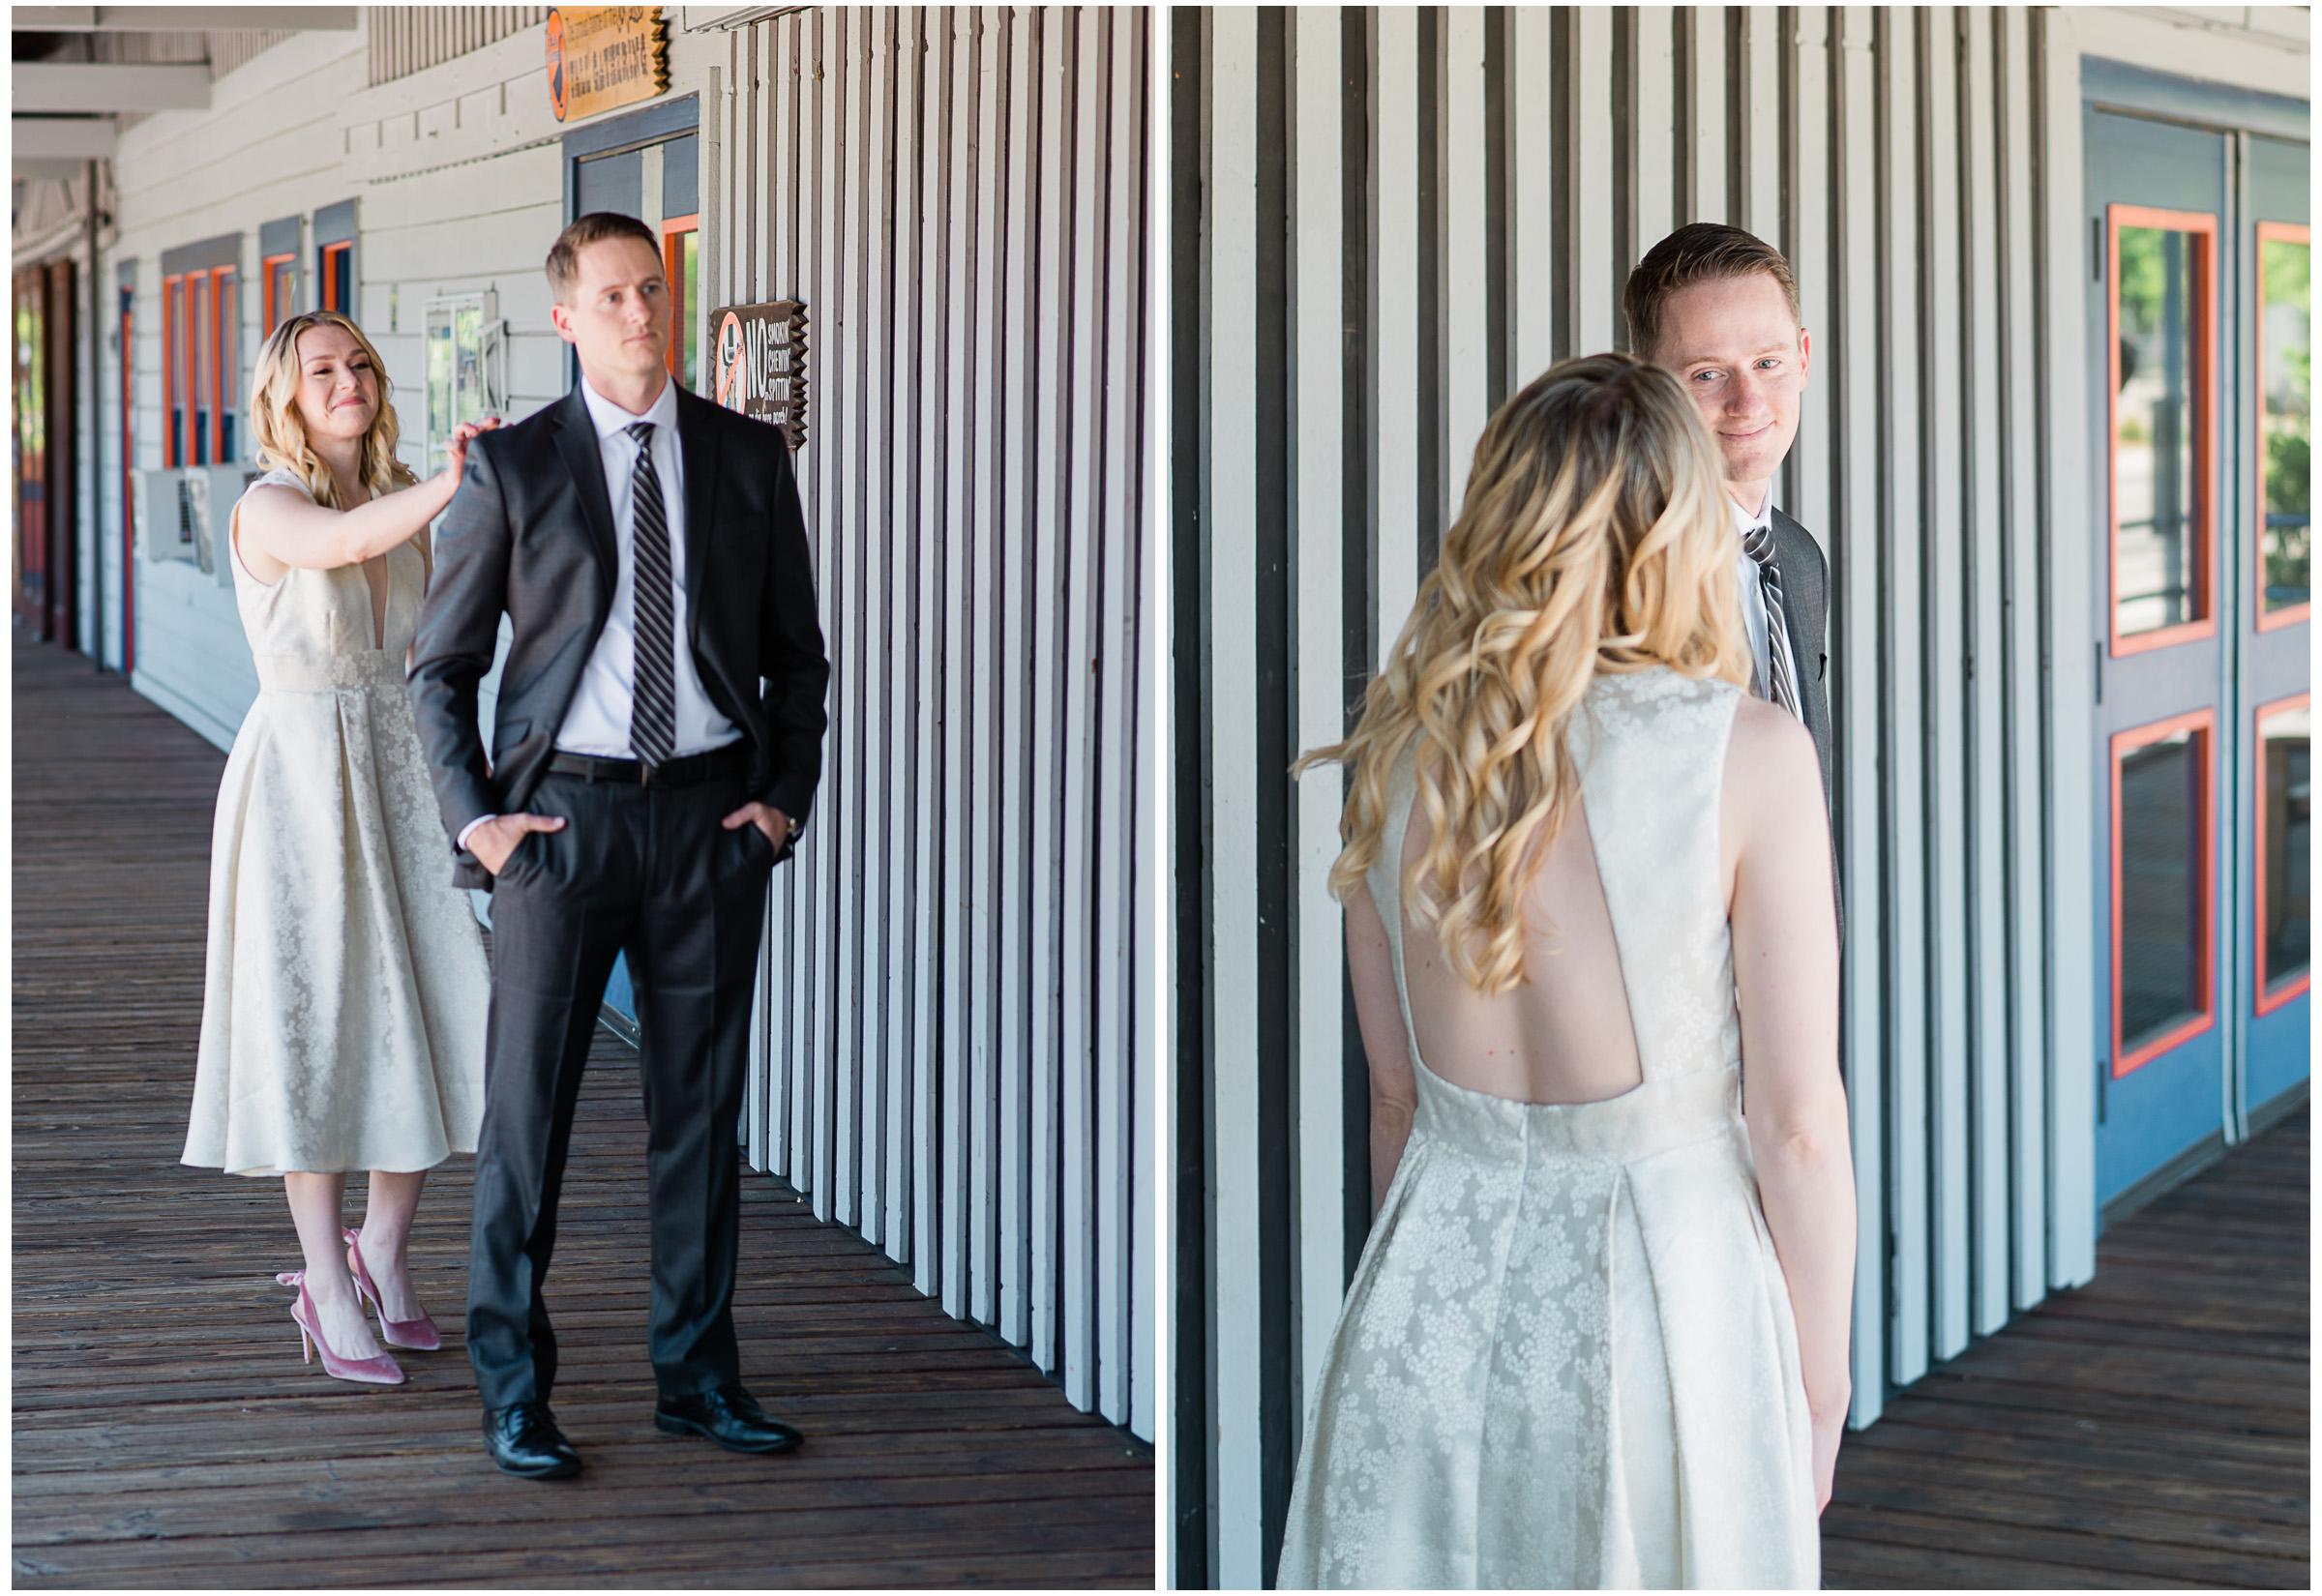 Loomis Wedding - Sacramento Photographer - Blue Goose - Justin Wilcox Photography - 8.jpg